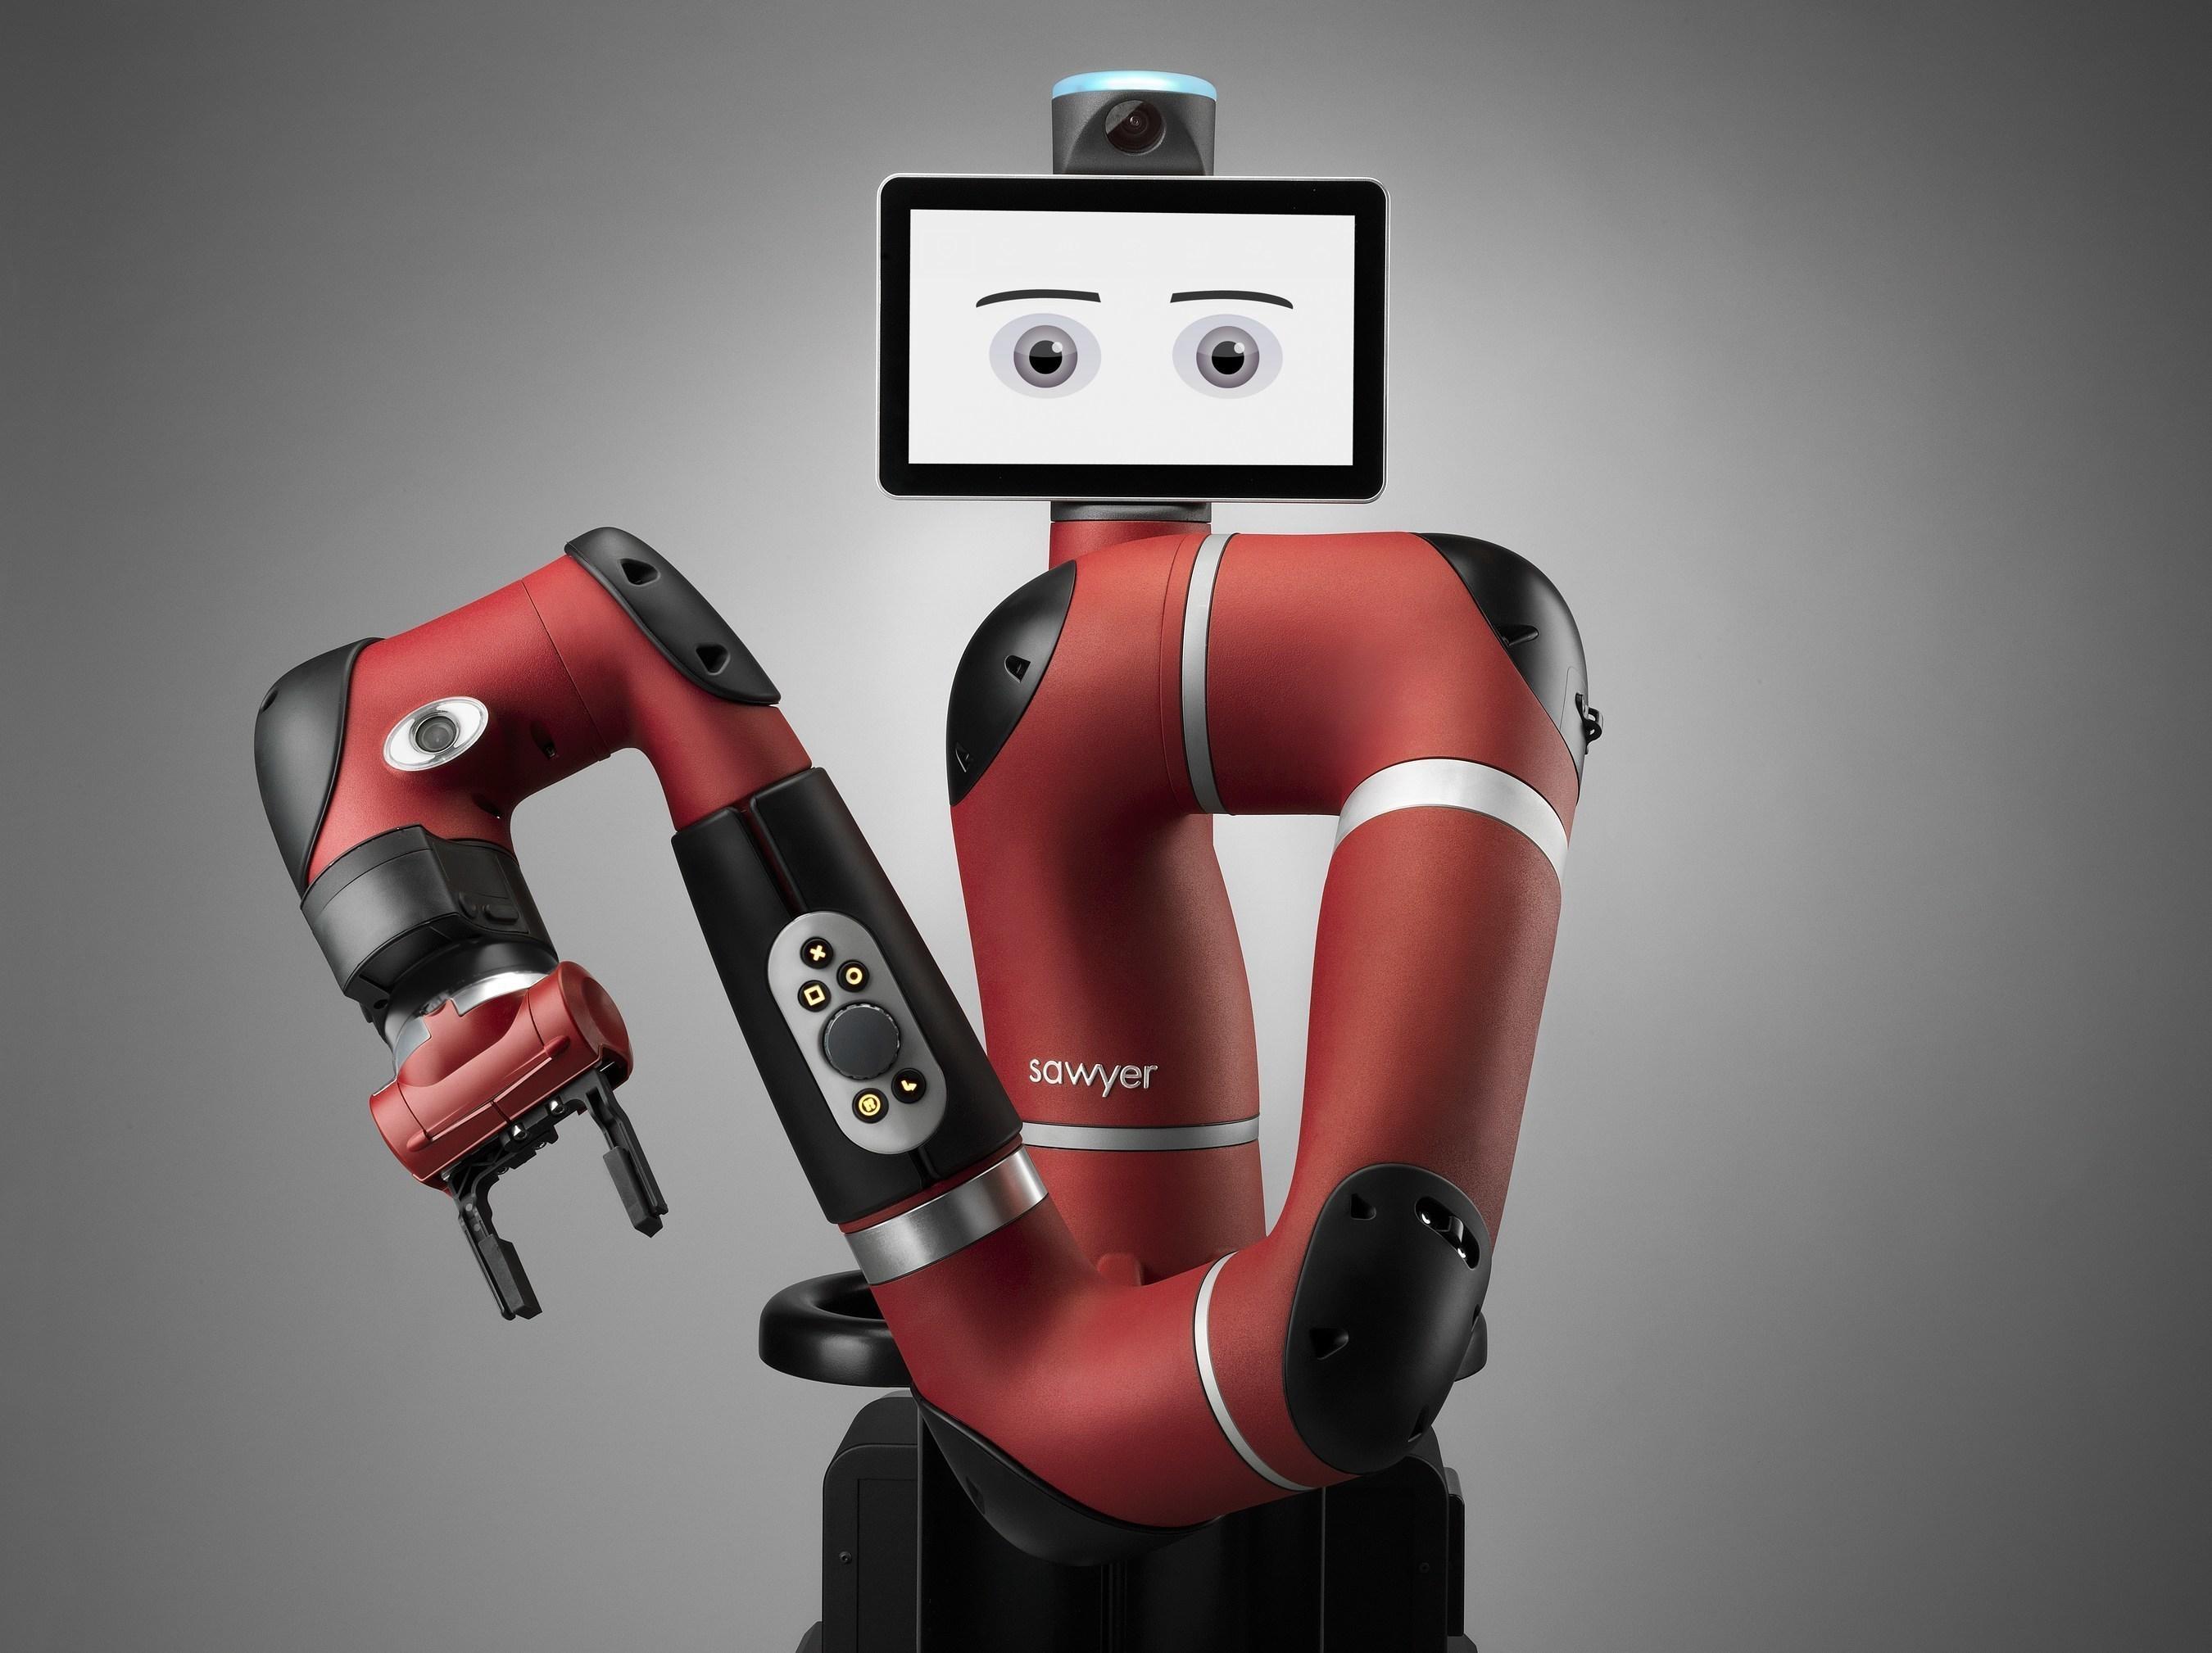 Rethink Robotics' Sawyer Robot with Open Source SDK